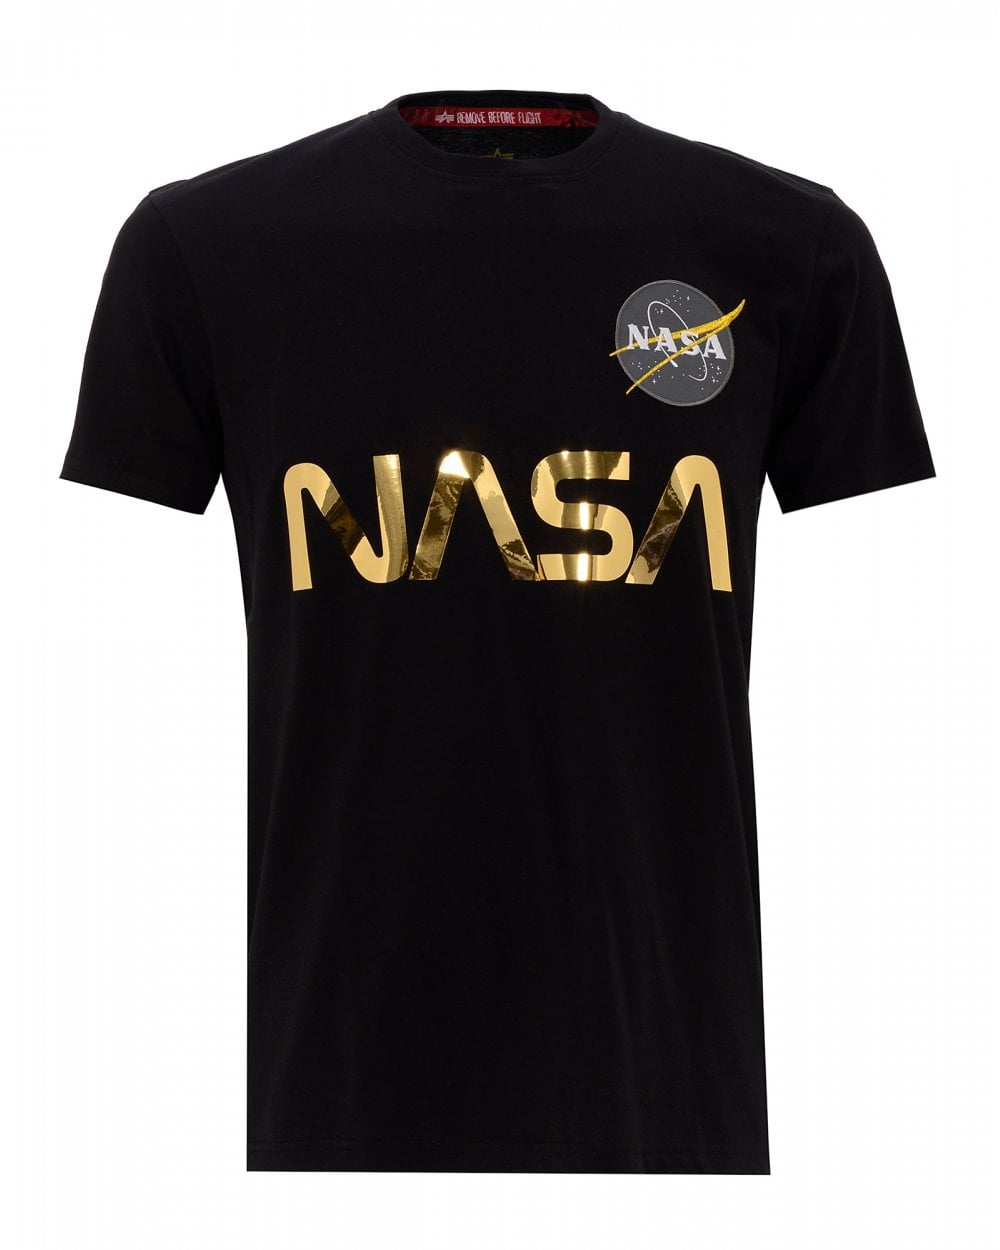 słodkie tanie outlet na sprzedaż super jakość Mens Nasa Reflective T-Shirt, Black & Gold Regular Fit Tee